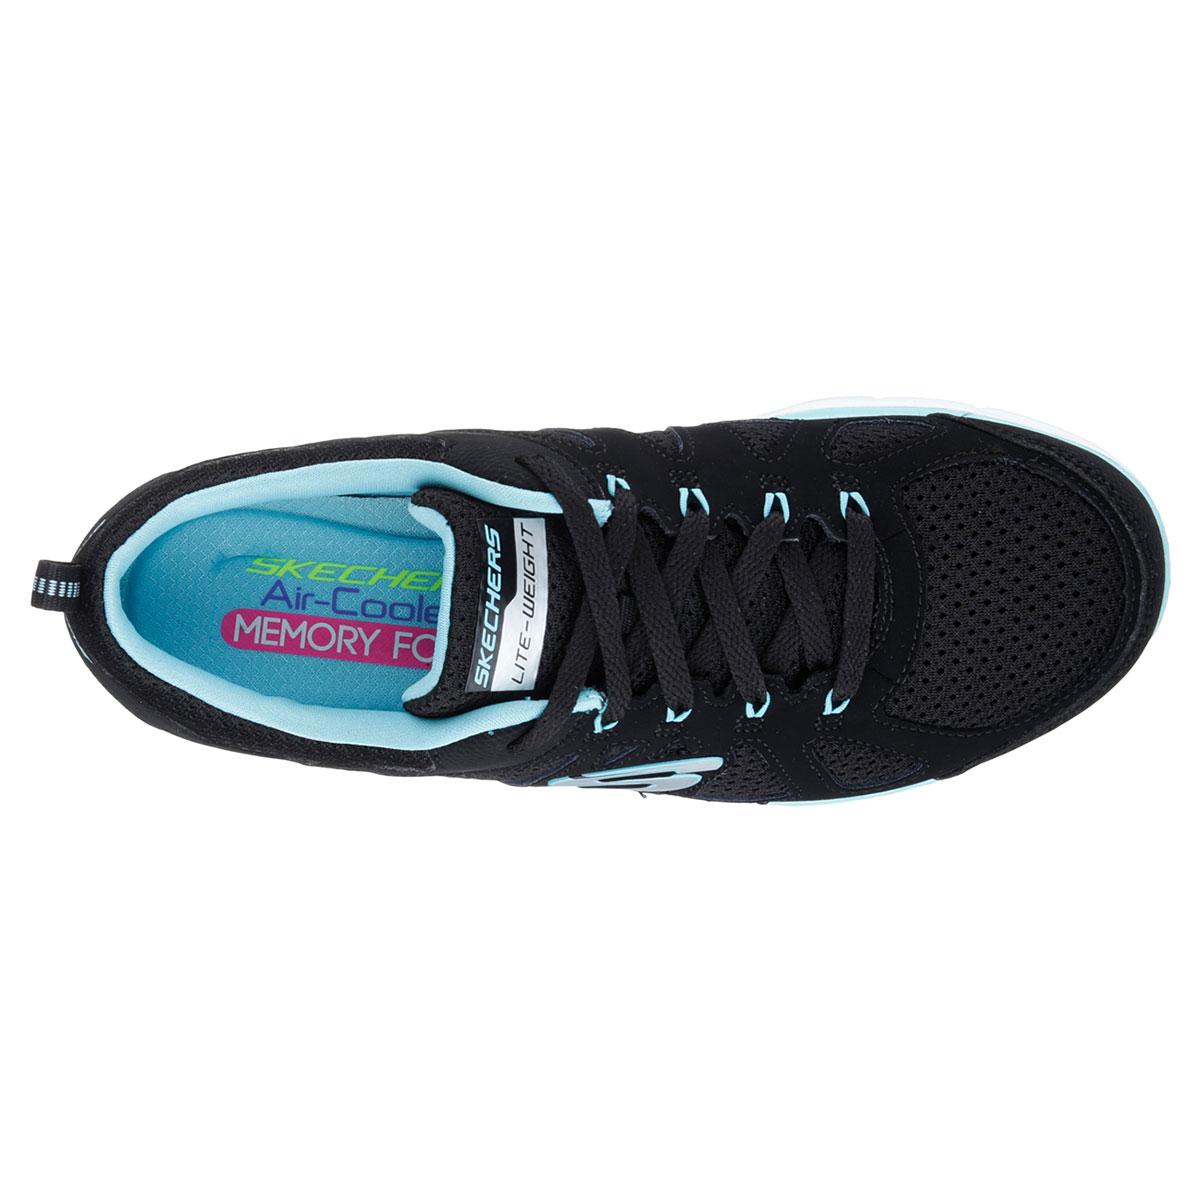 837d710860d1 Skechers Womens Flex Appeal 2.0 - Simplistic Lightweight Trainers